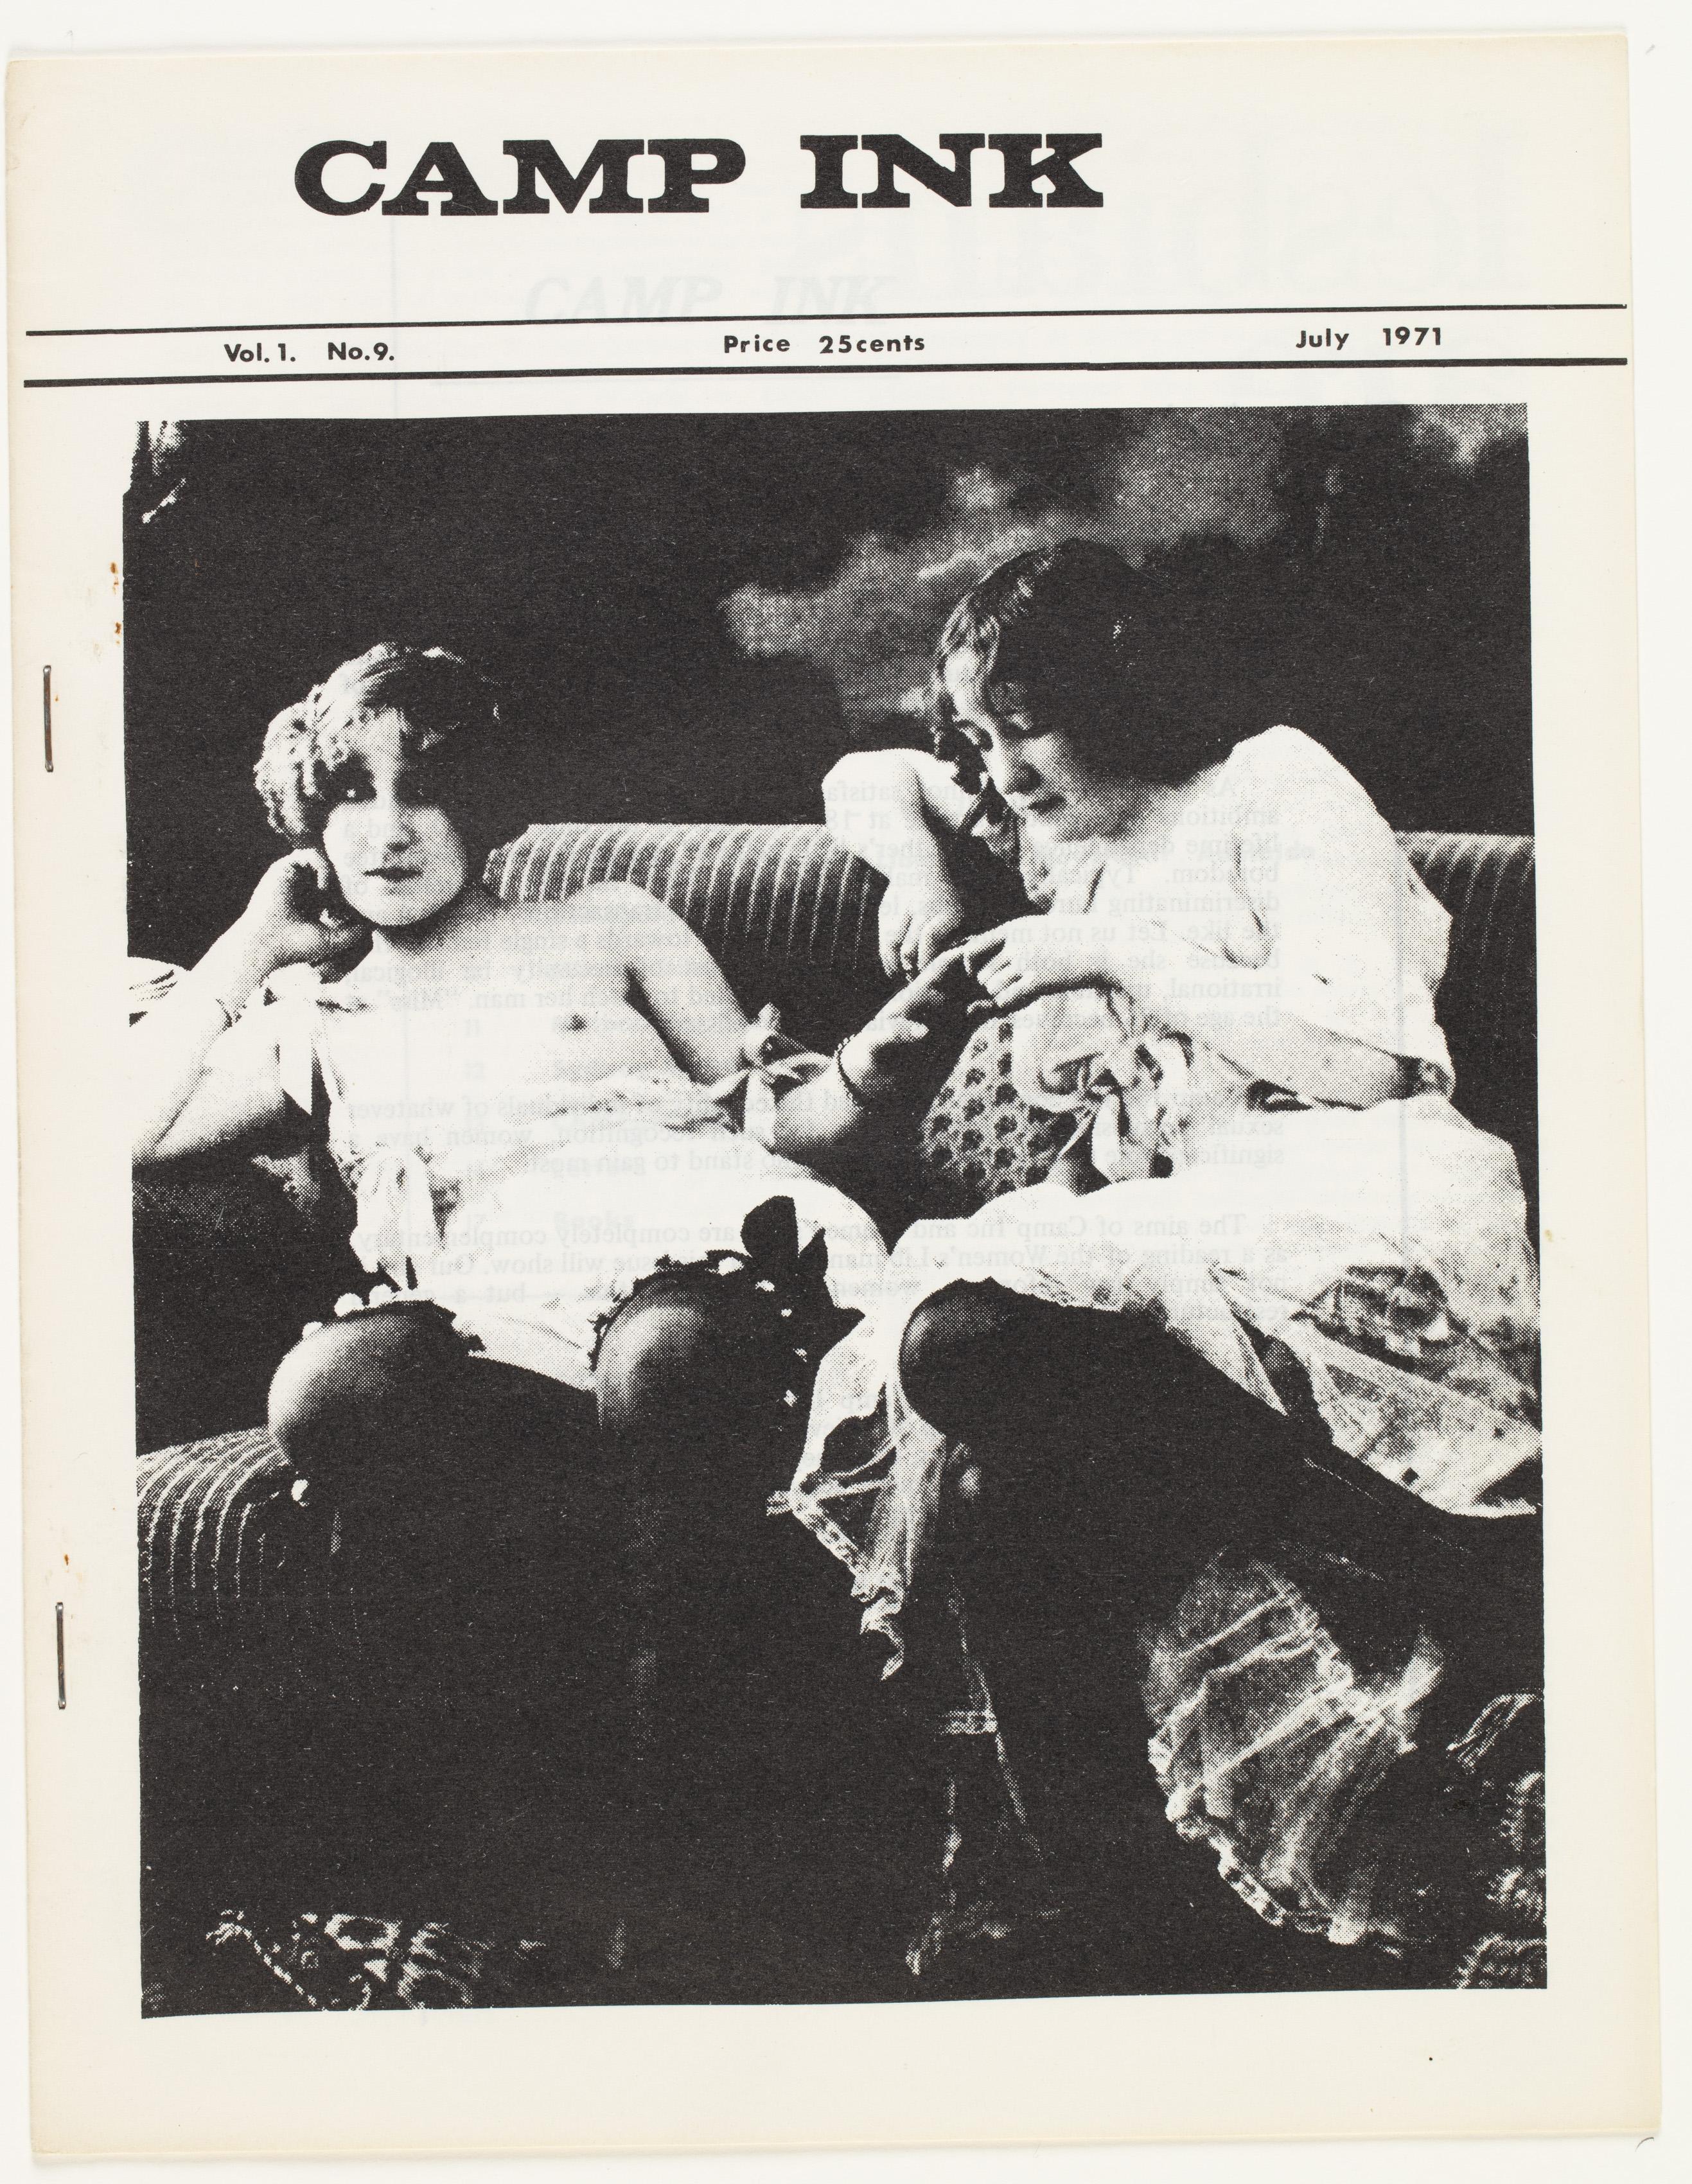 Camp Ink. Vol. 1, No.9 (July 1971)